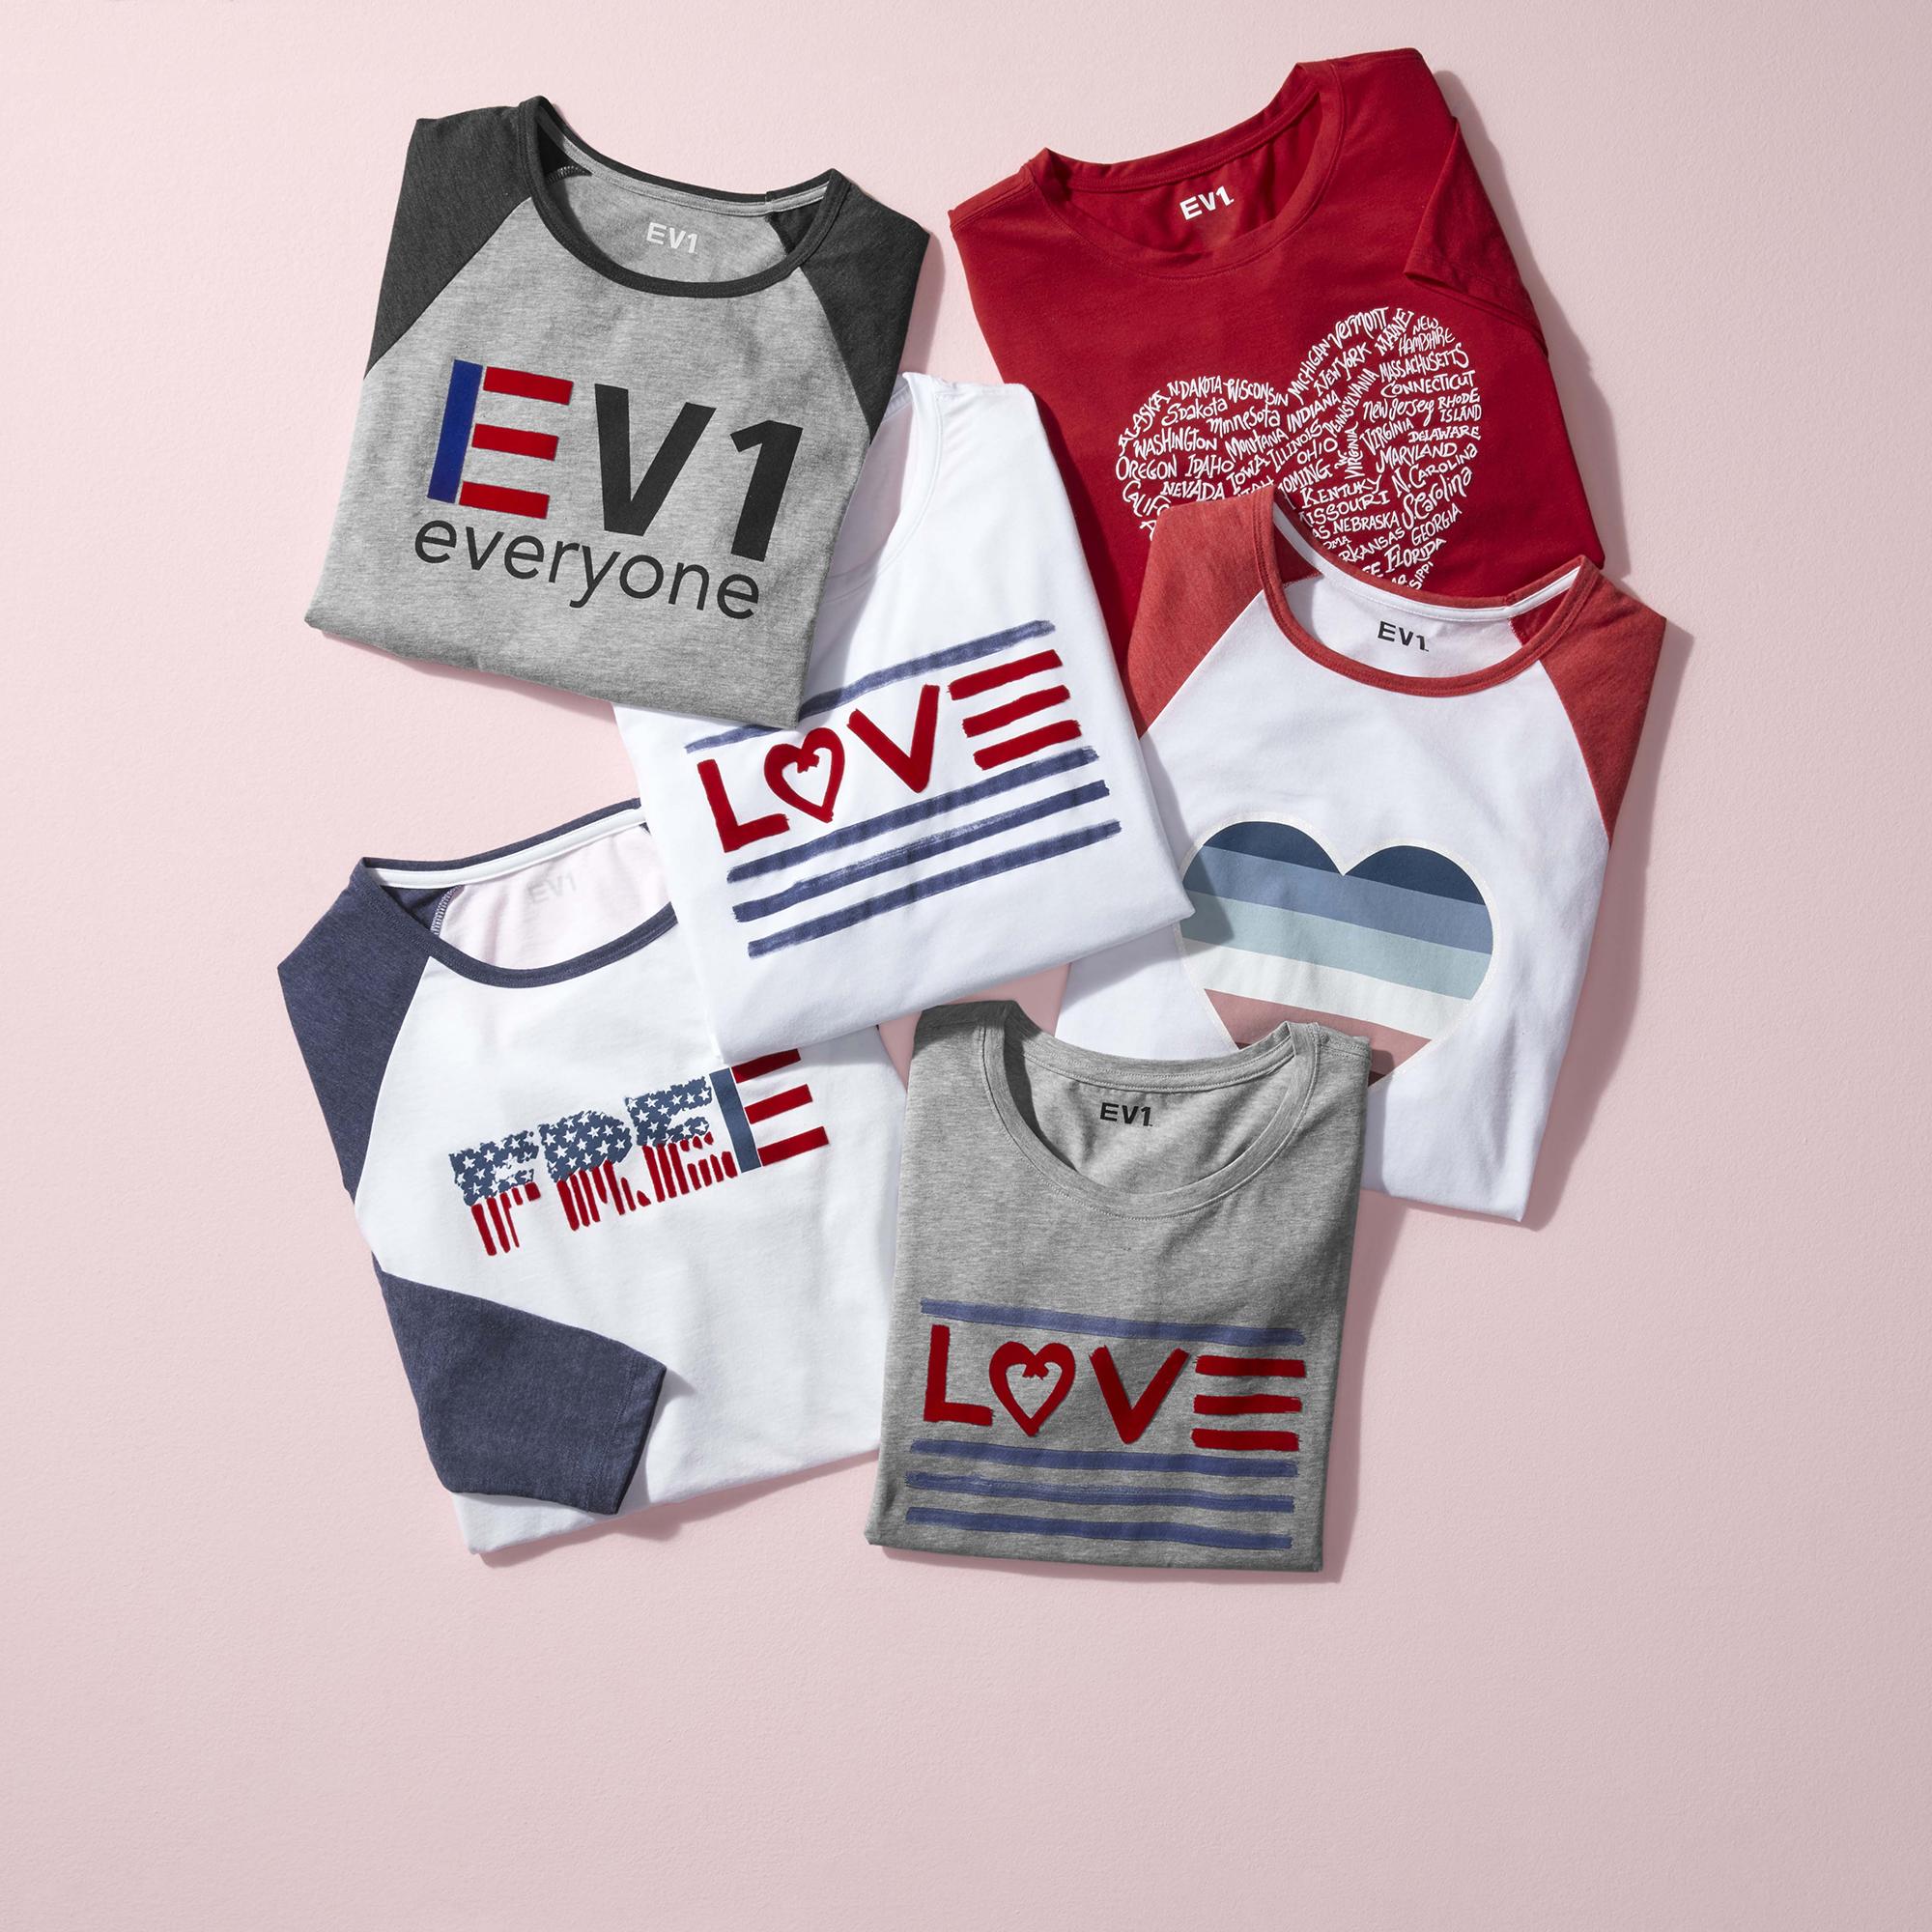 Shop Ellen S Walmart Line Sneakers Jeans Inspiring T Shirts